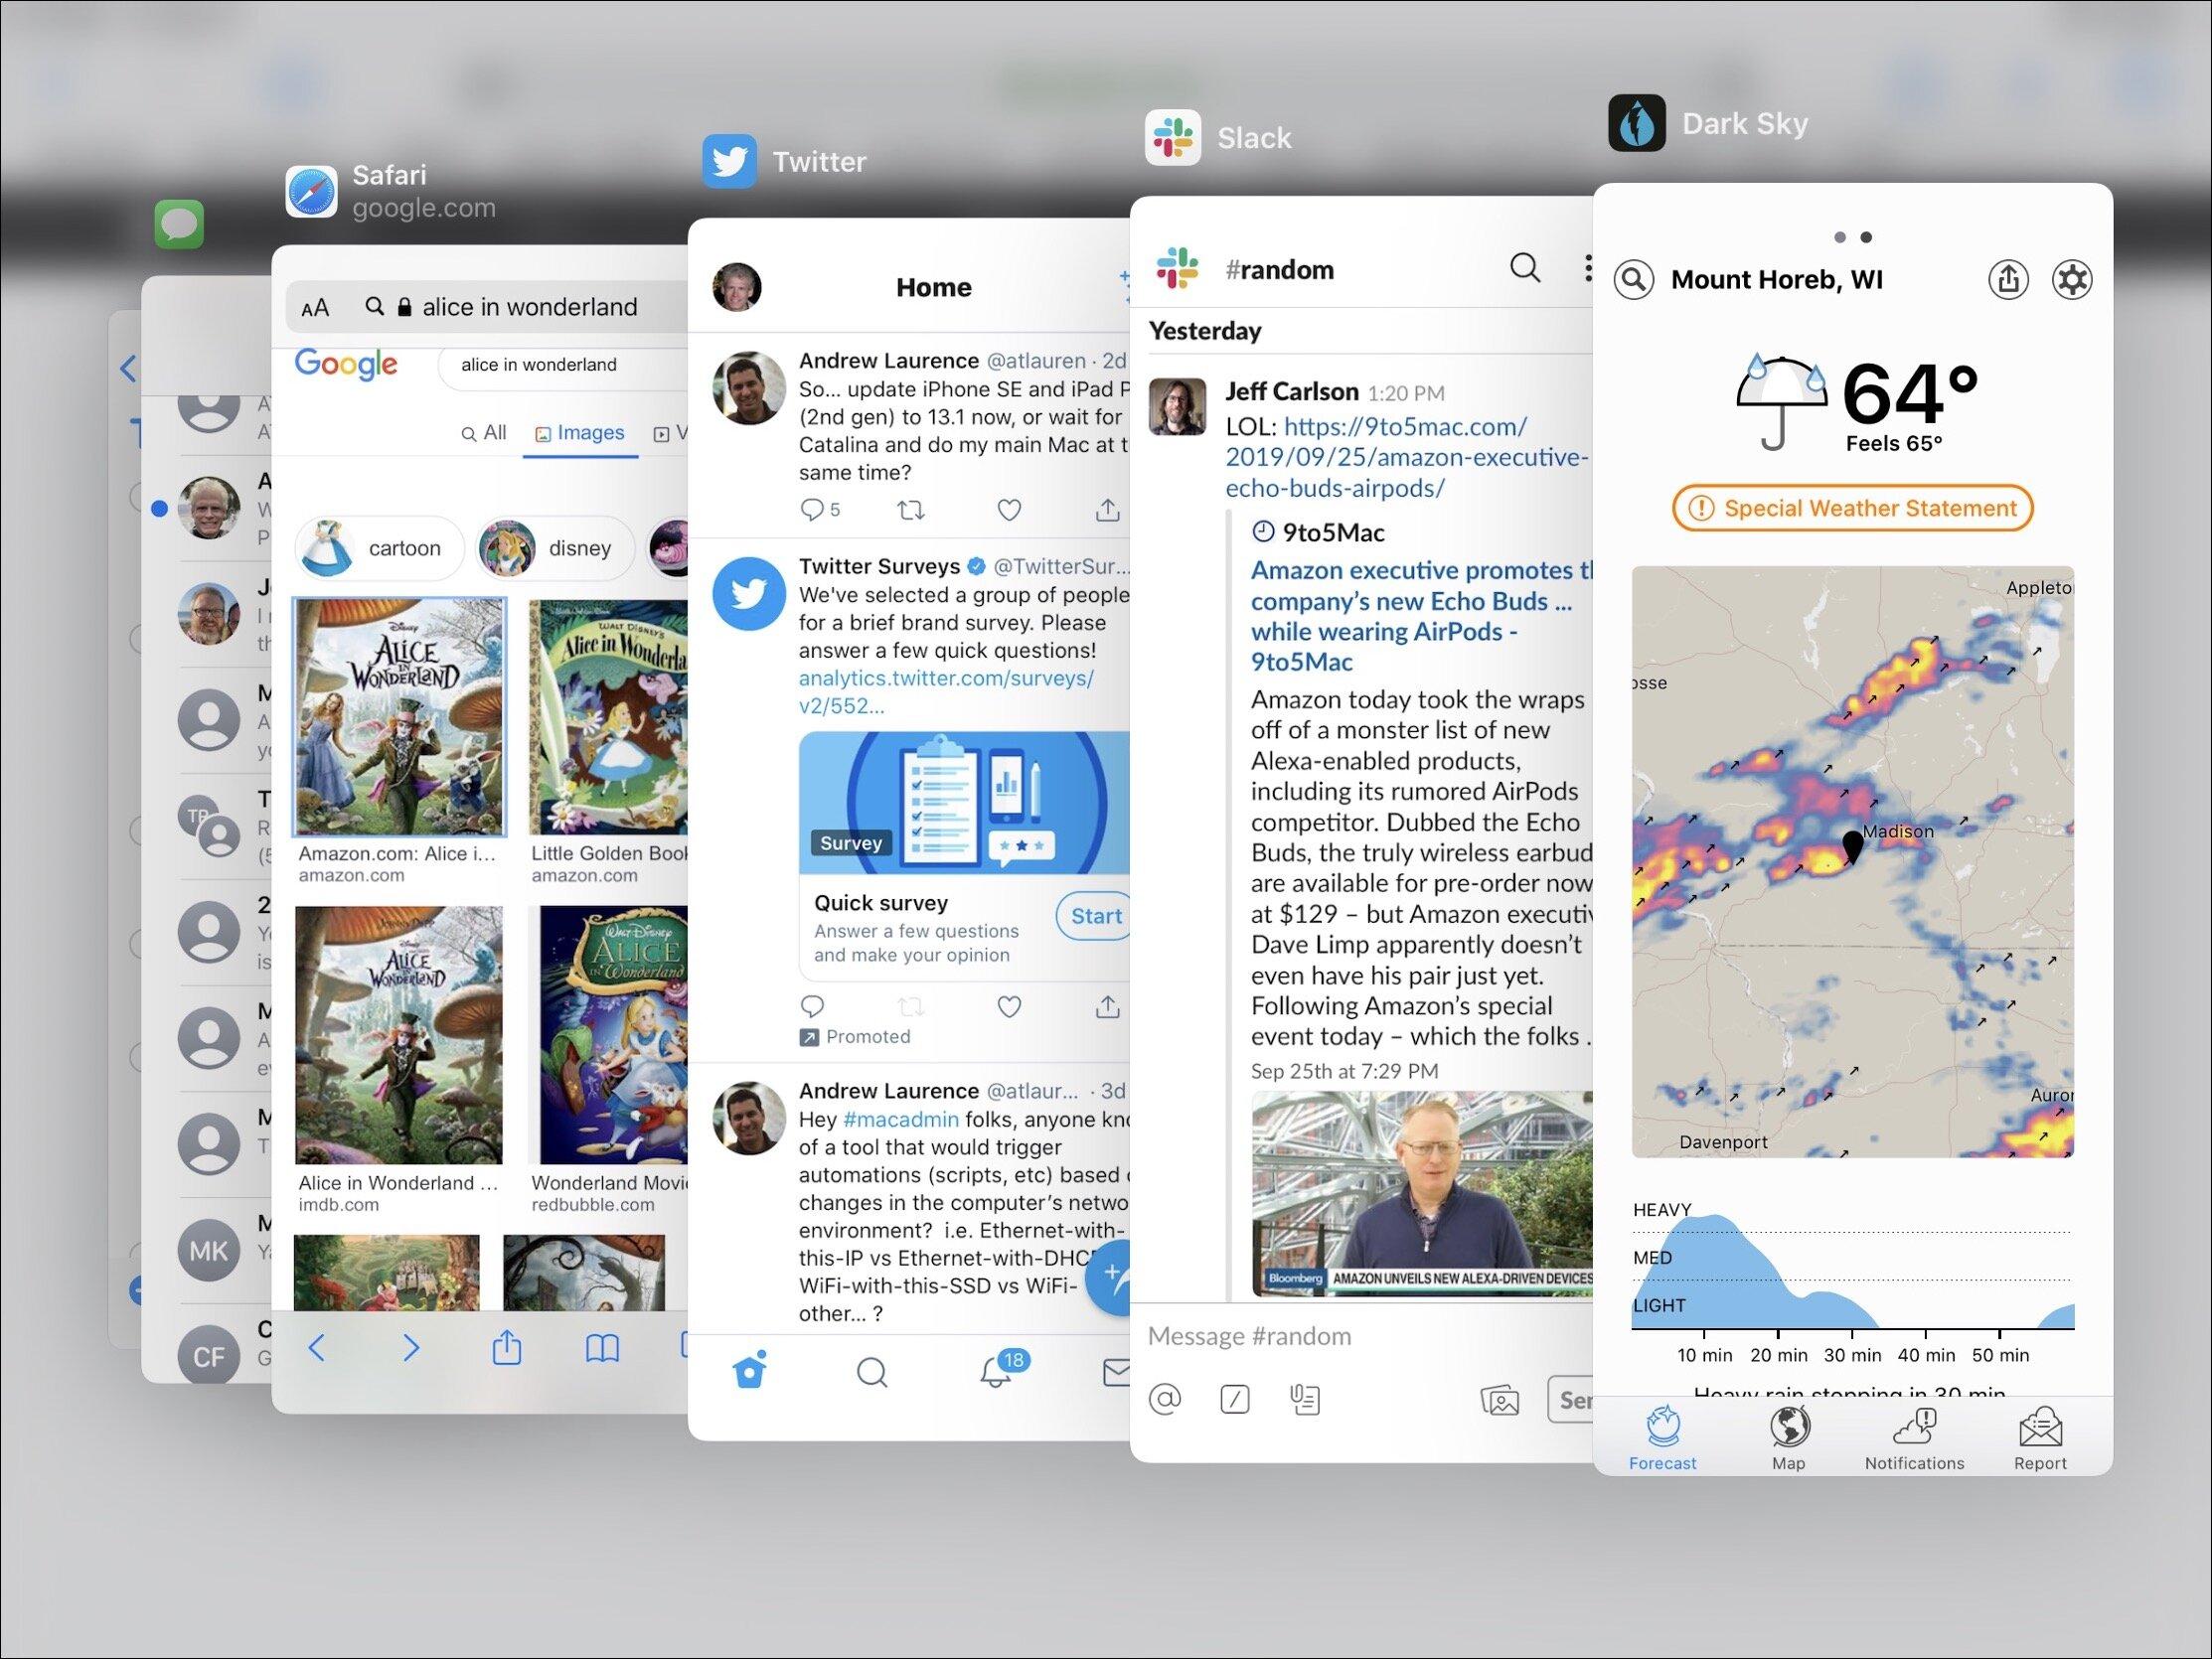 iPadOS-multitasking-Slide-Over-switcher.jpg